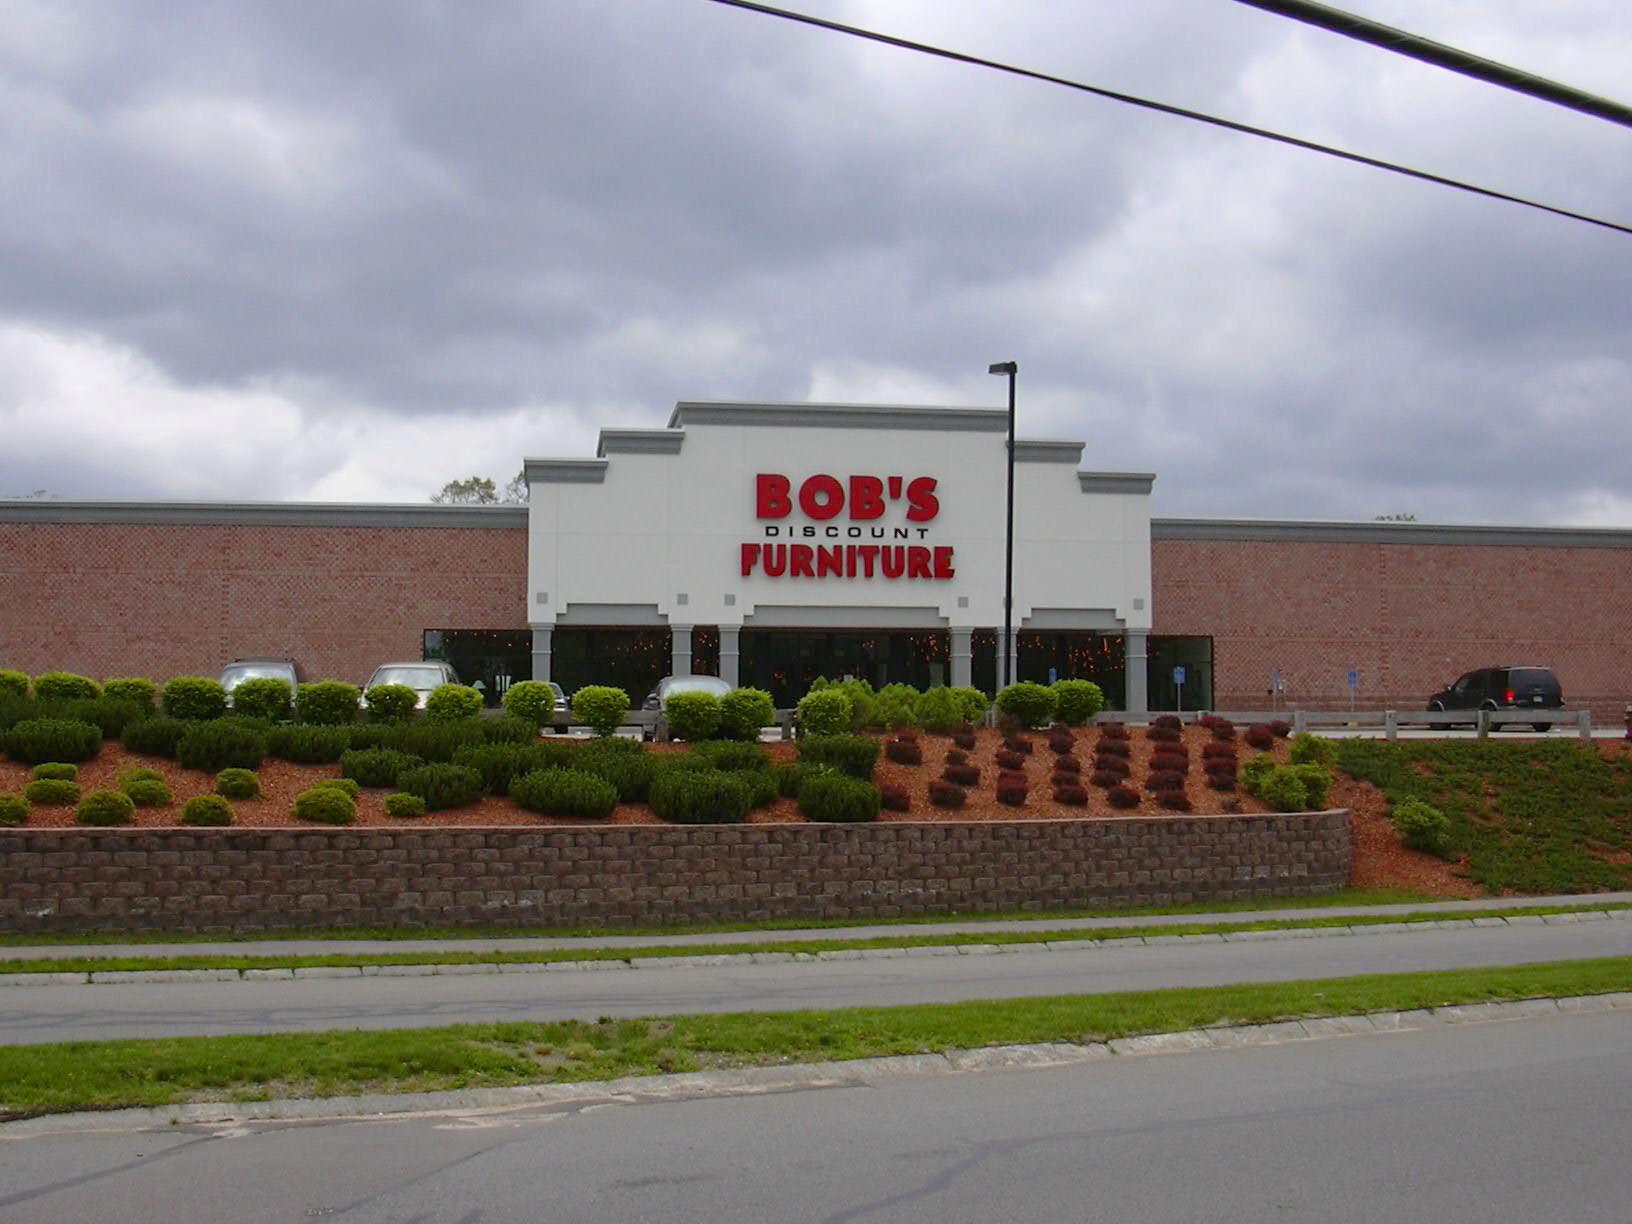 Outstanding Bob Discount Furniture Store 1632 x 1224 · 279 kB · jpeg